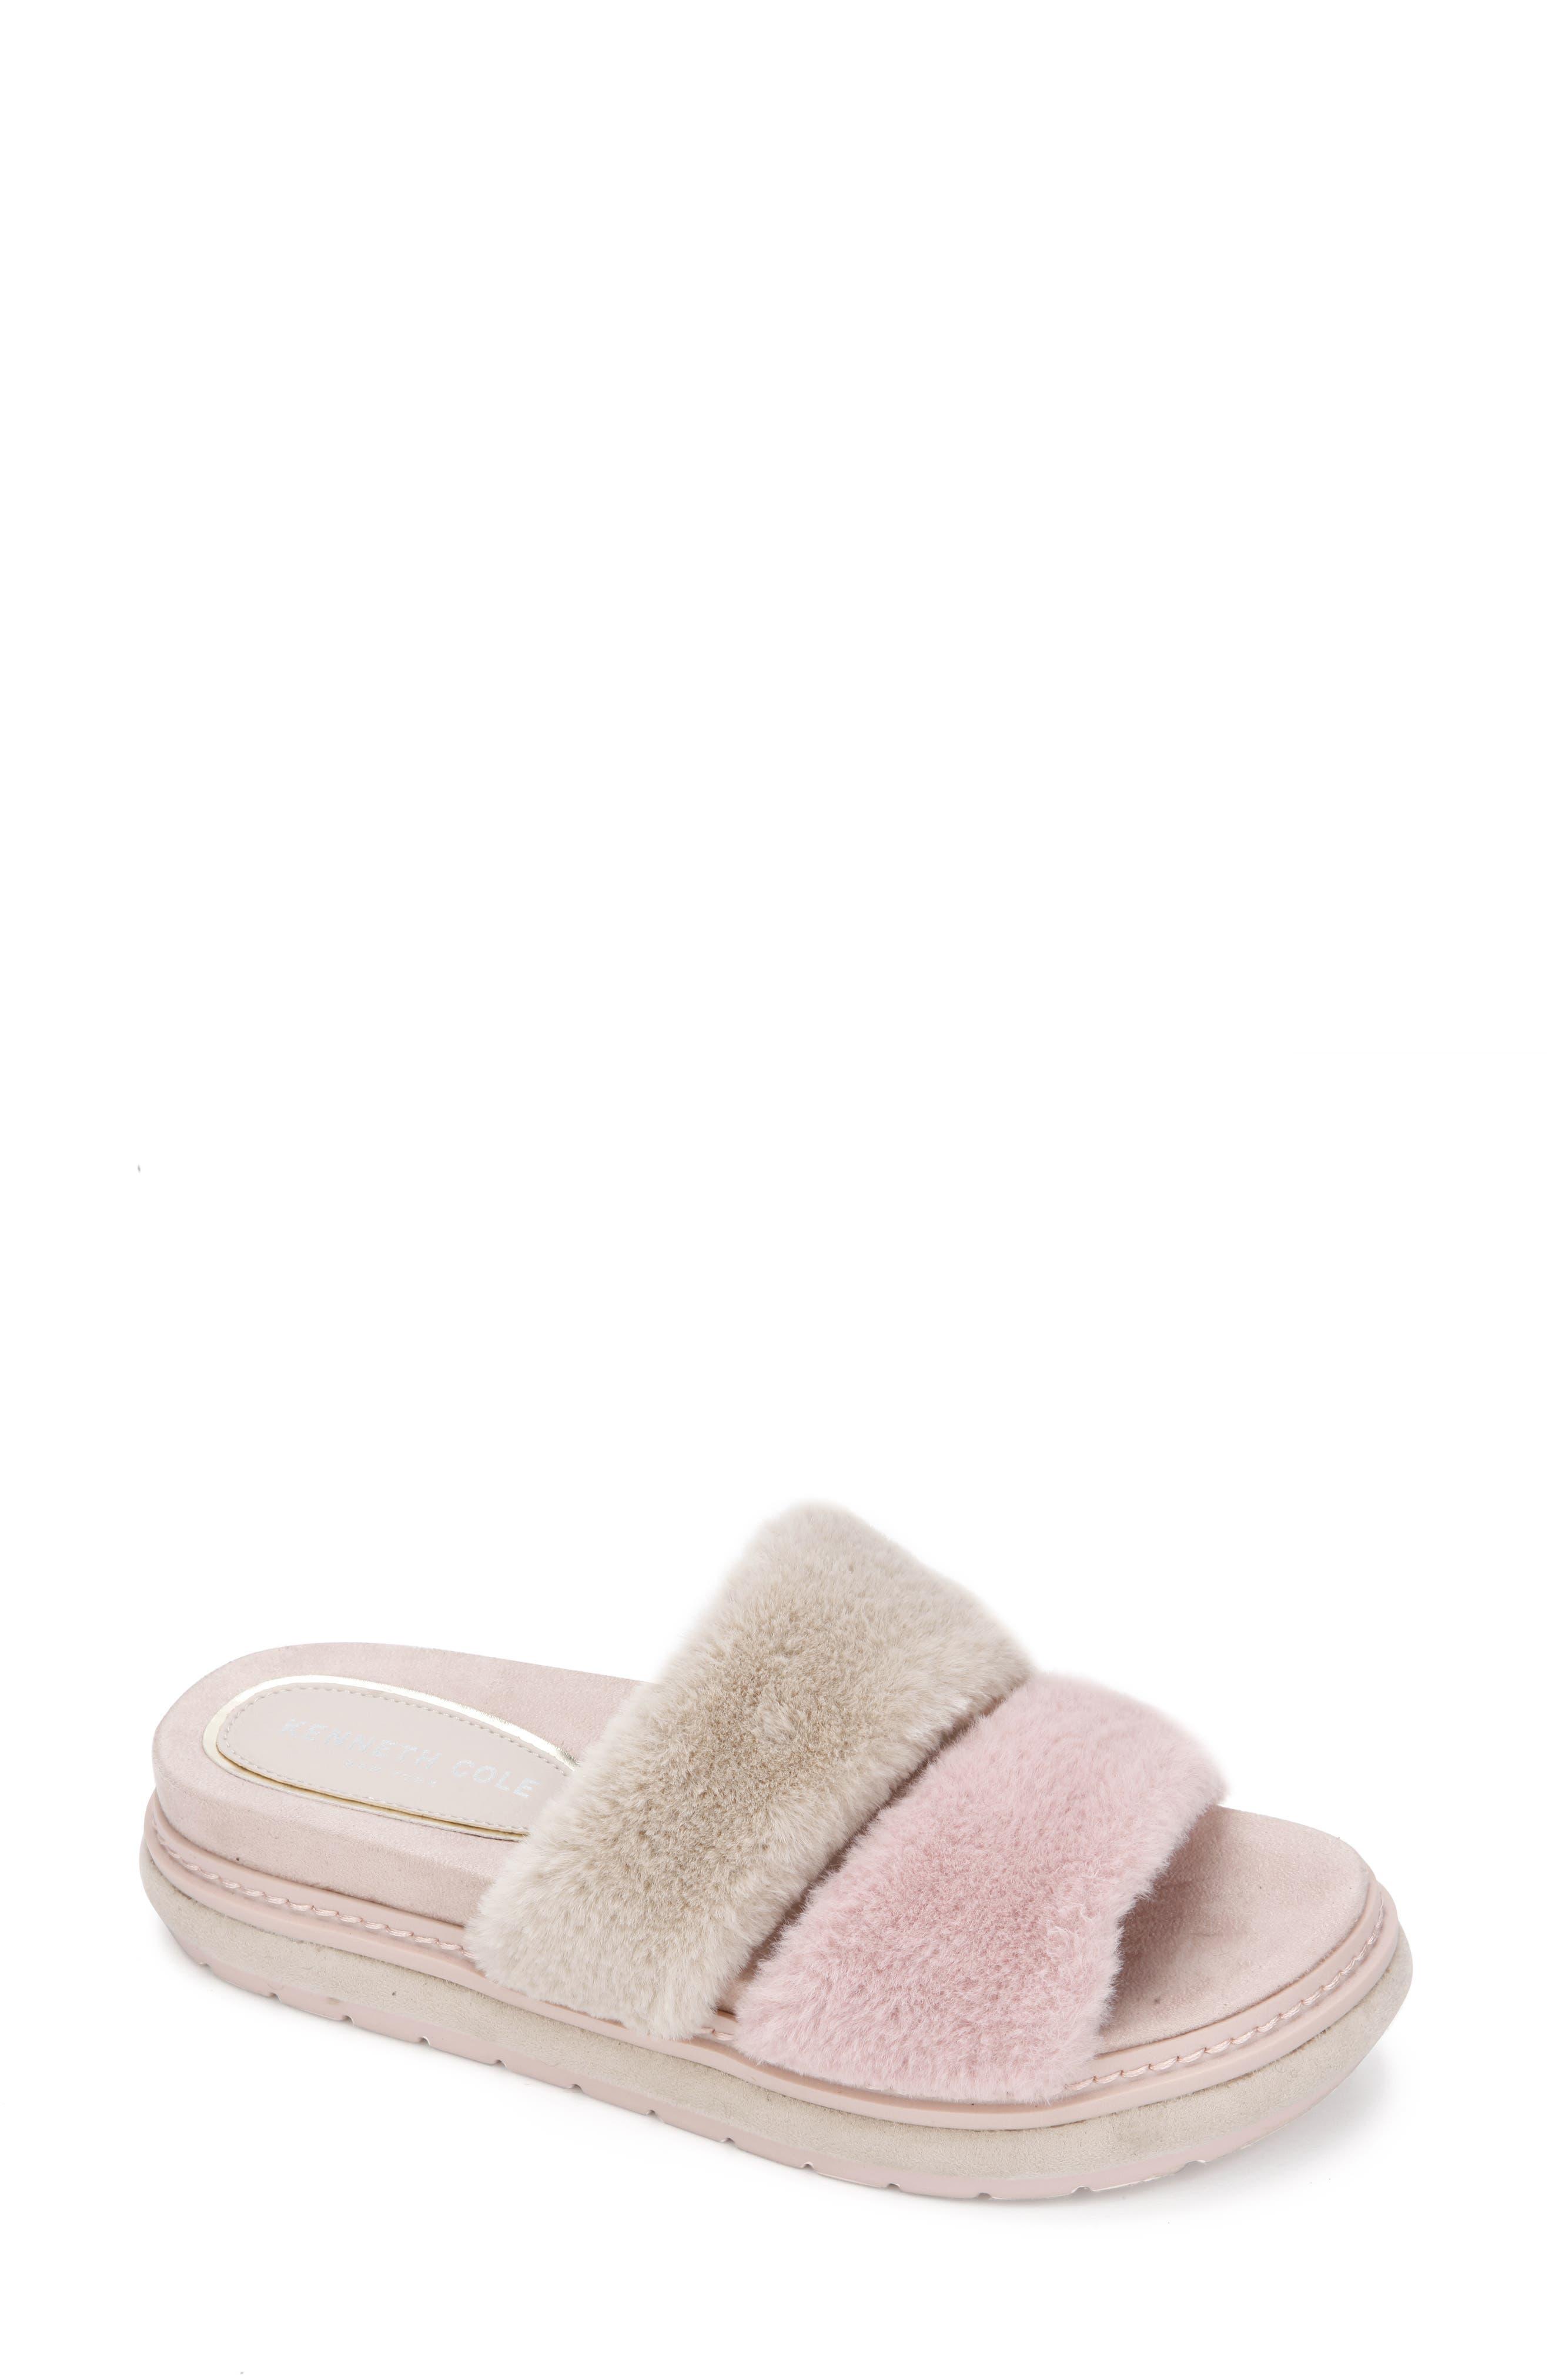 Laney Cozy Slide Sandal